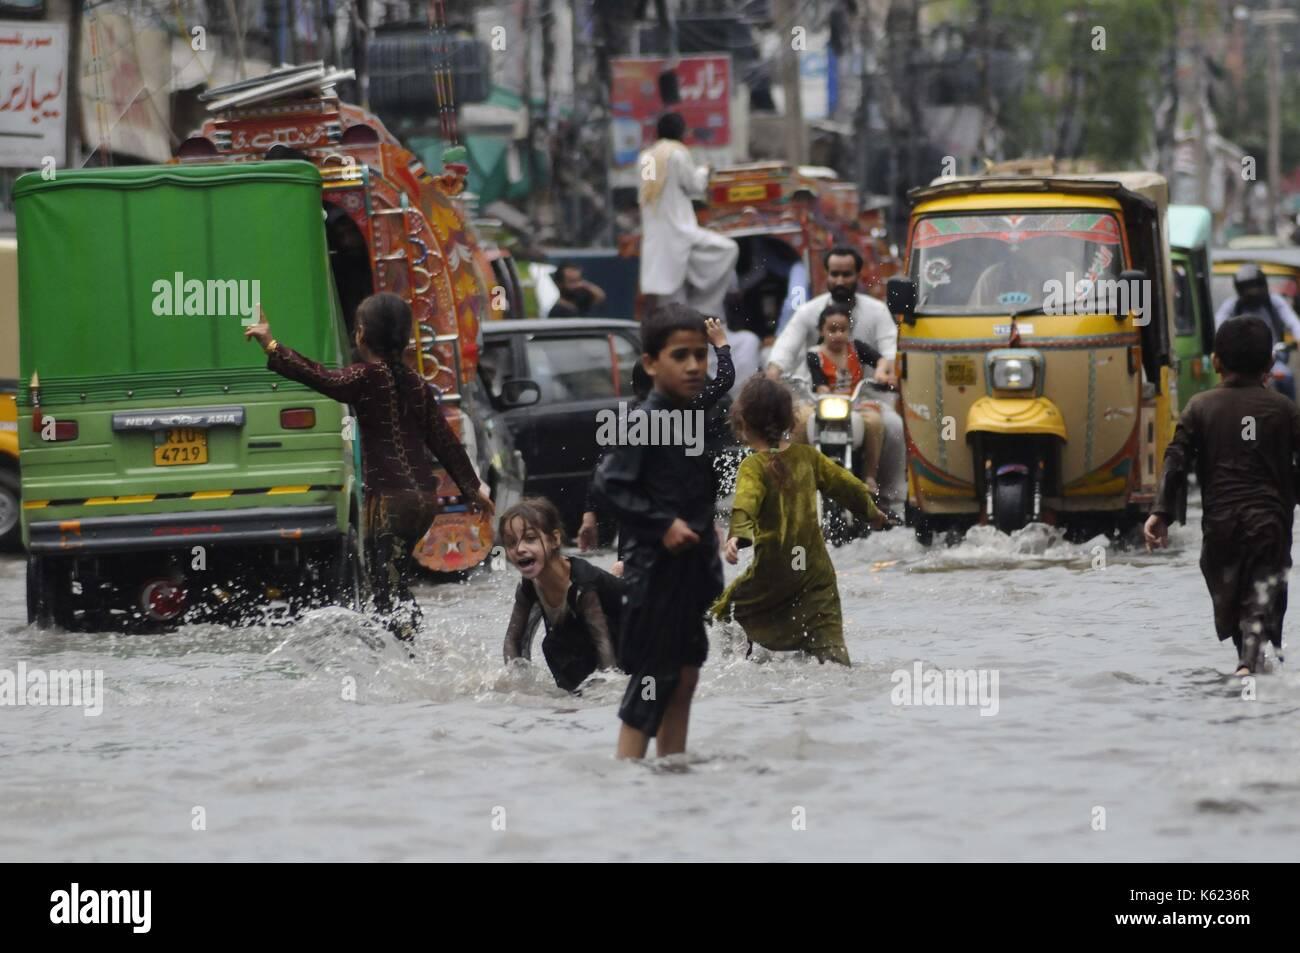 Rawalpindi, Pakistan  10th Sep, 2017  A view of children